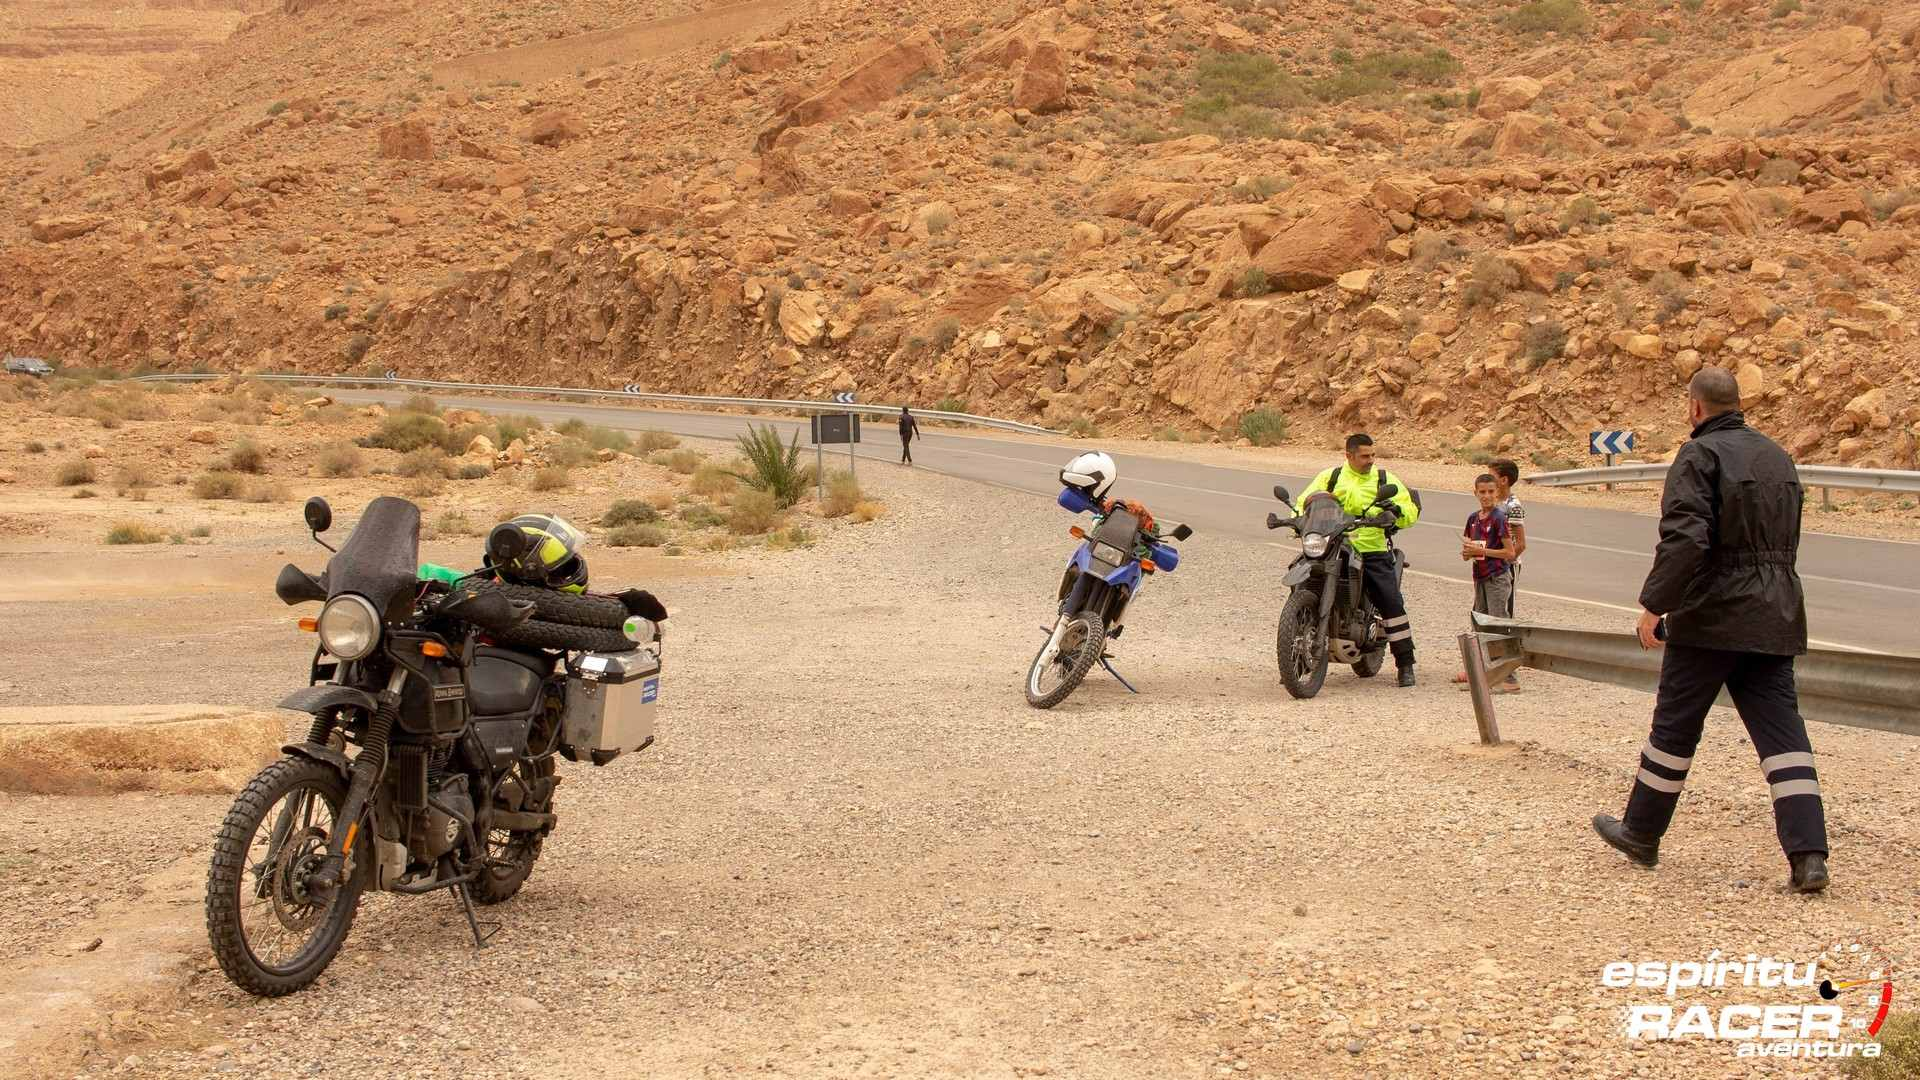 15 dias por Marruecos con Royal Enfield Himalayan 96